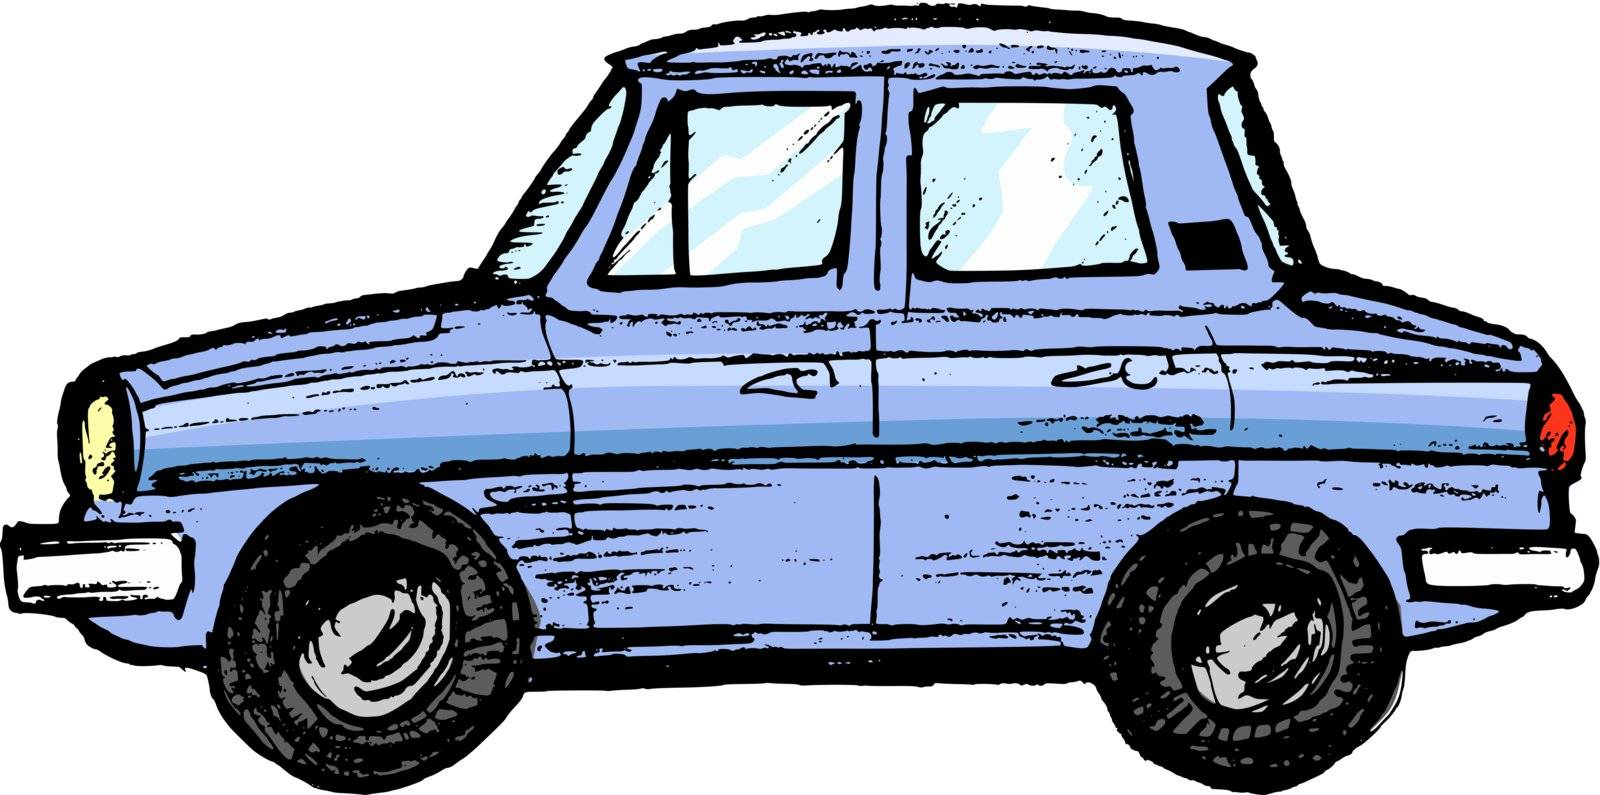 hand drawn, sketch, cartoon illustration of model of car